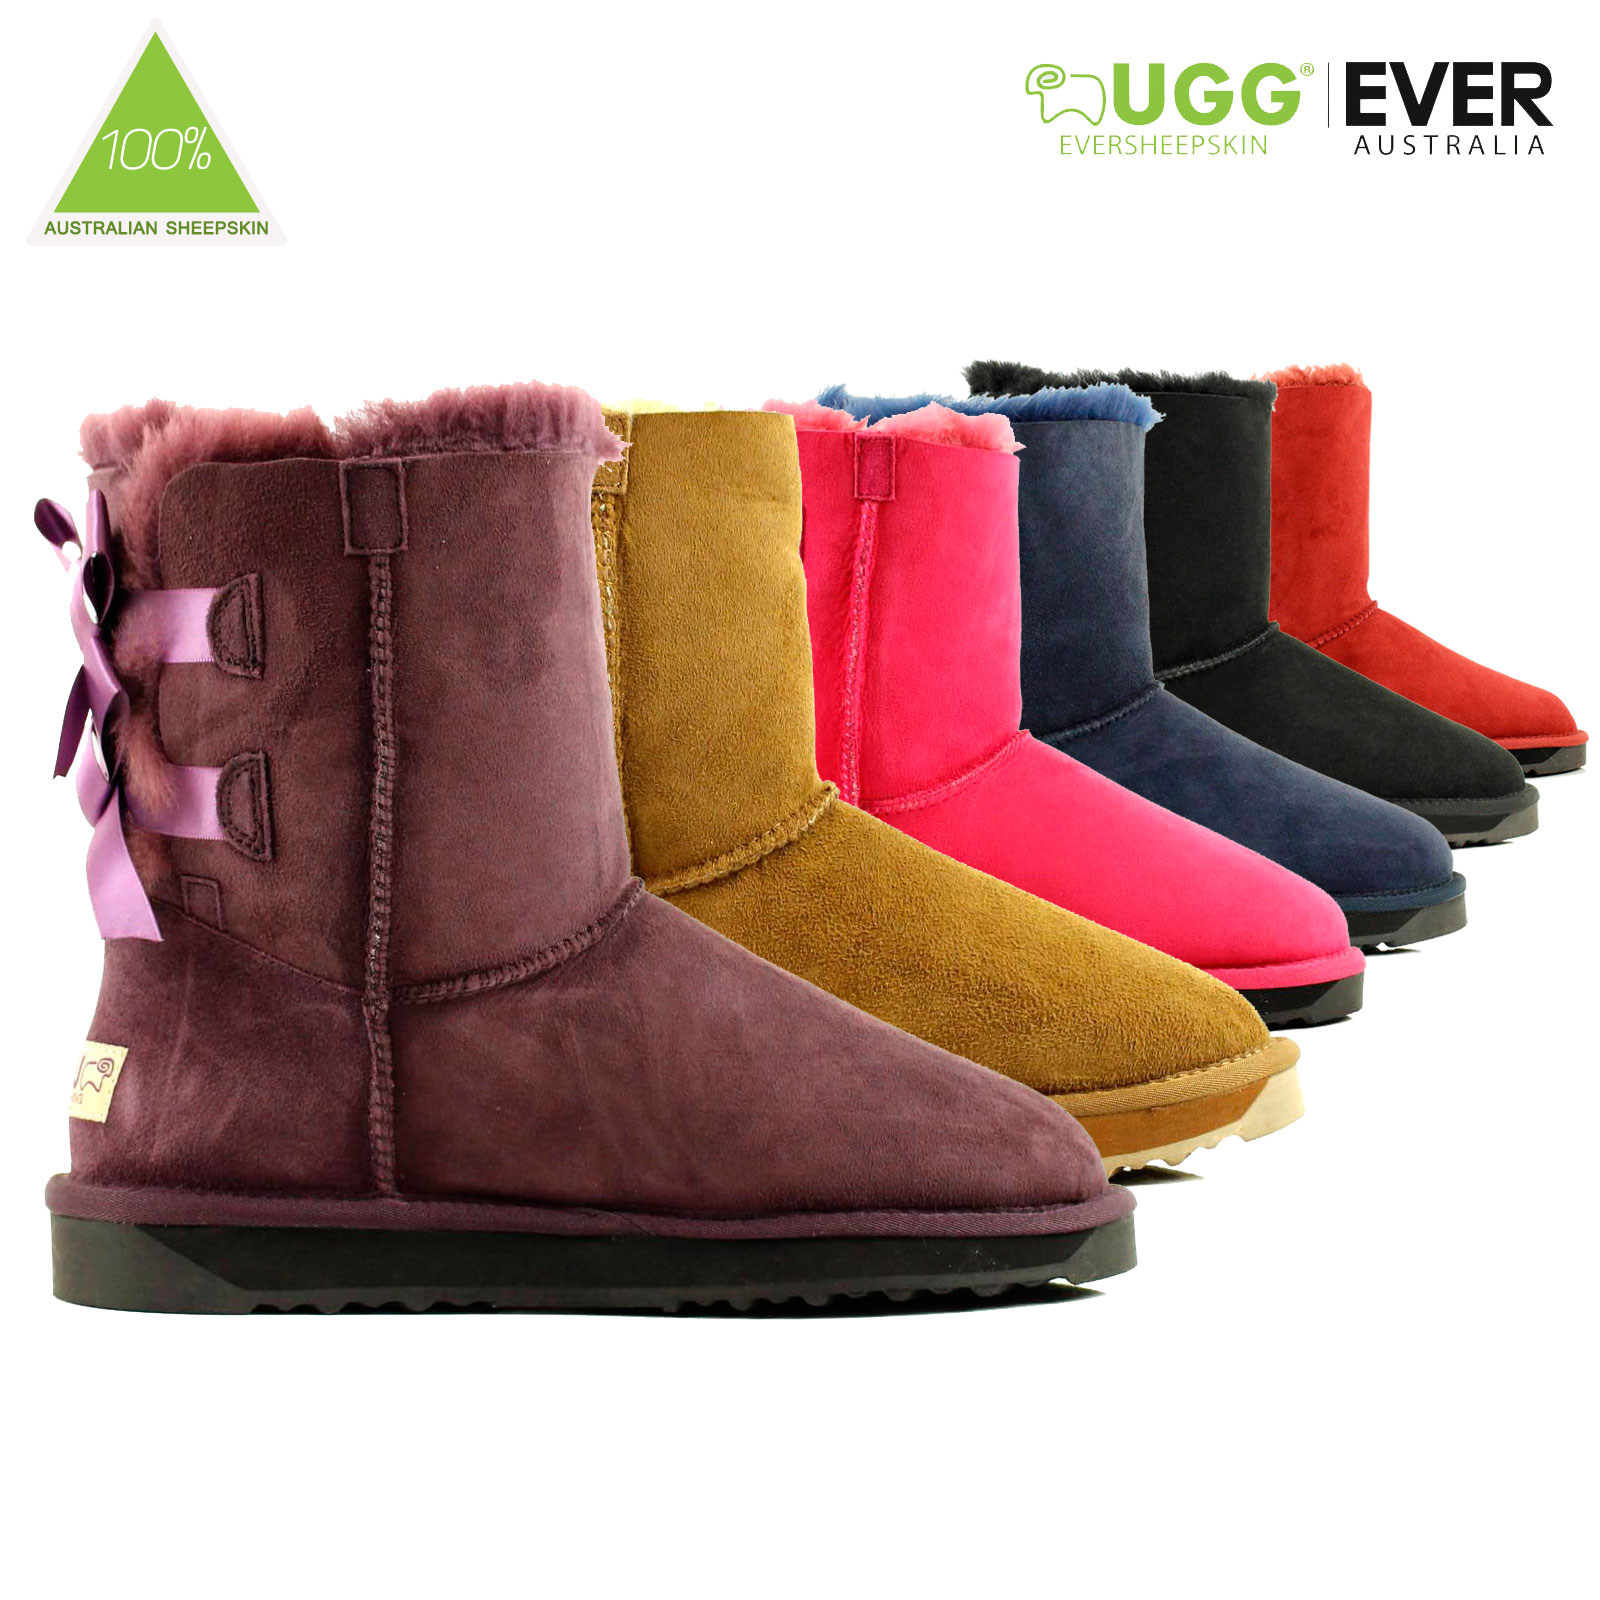 Ugg-Boots-Sheepskin-100-Australian-Wool-Ladies-Short-